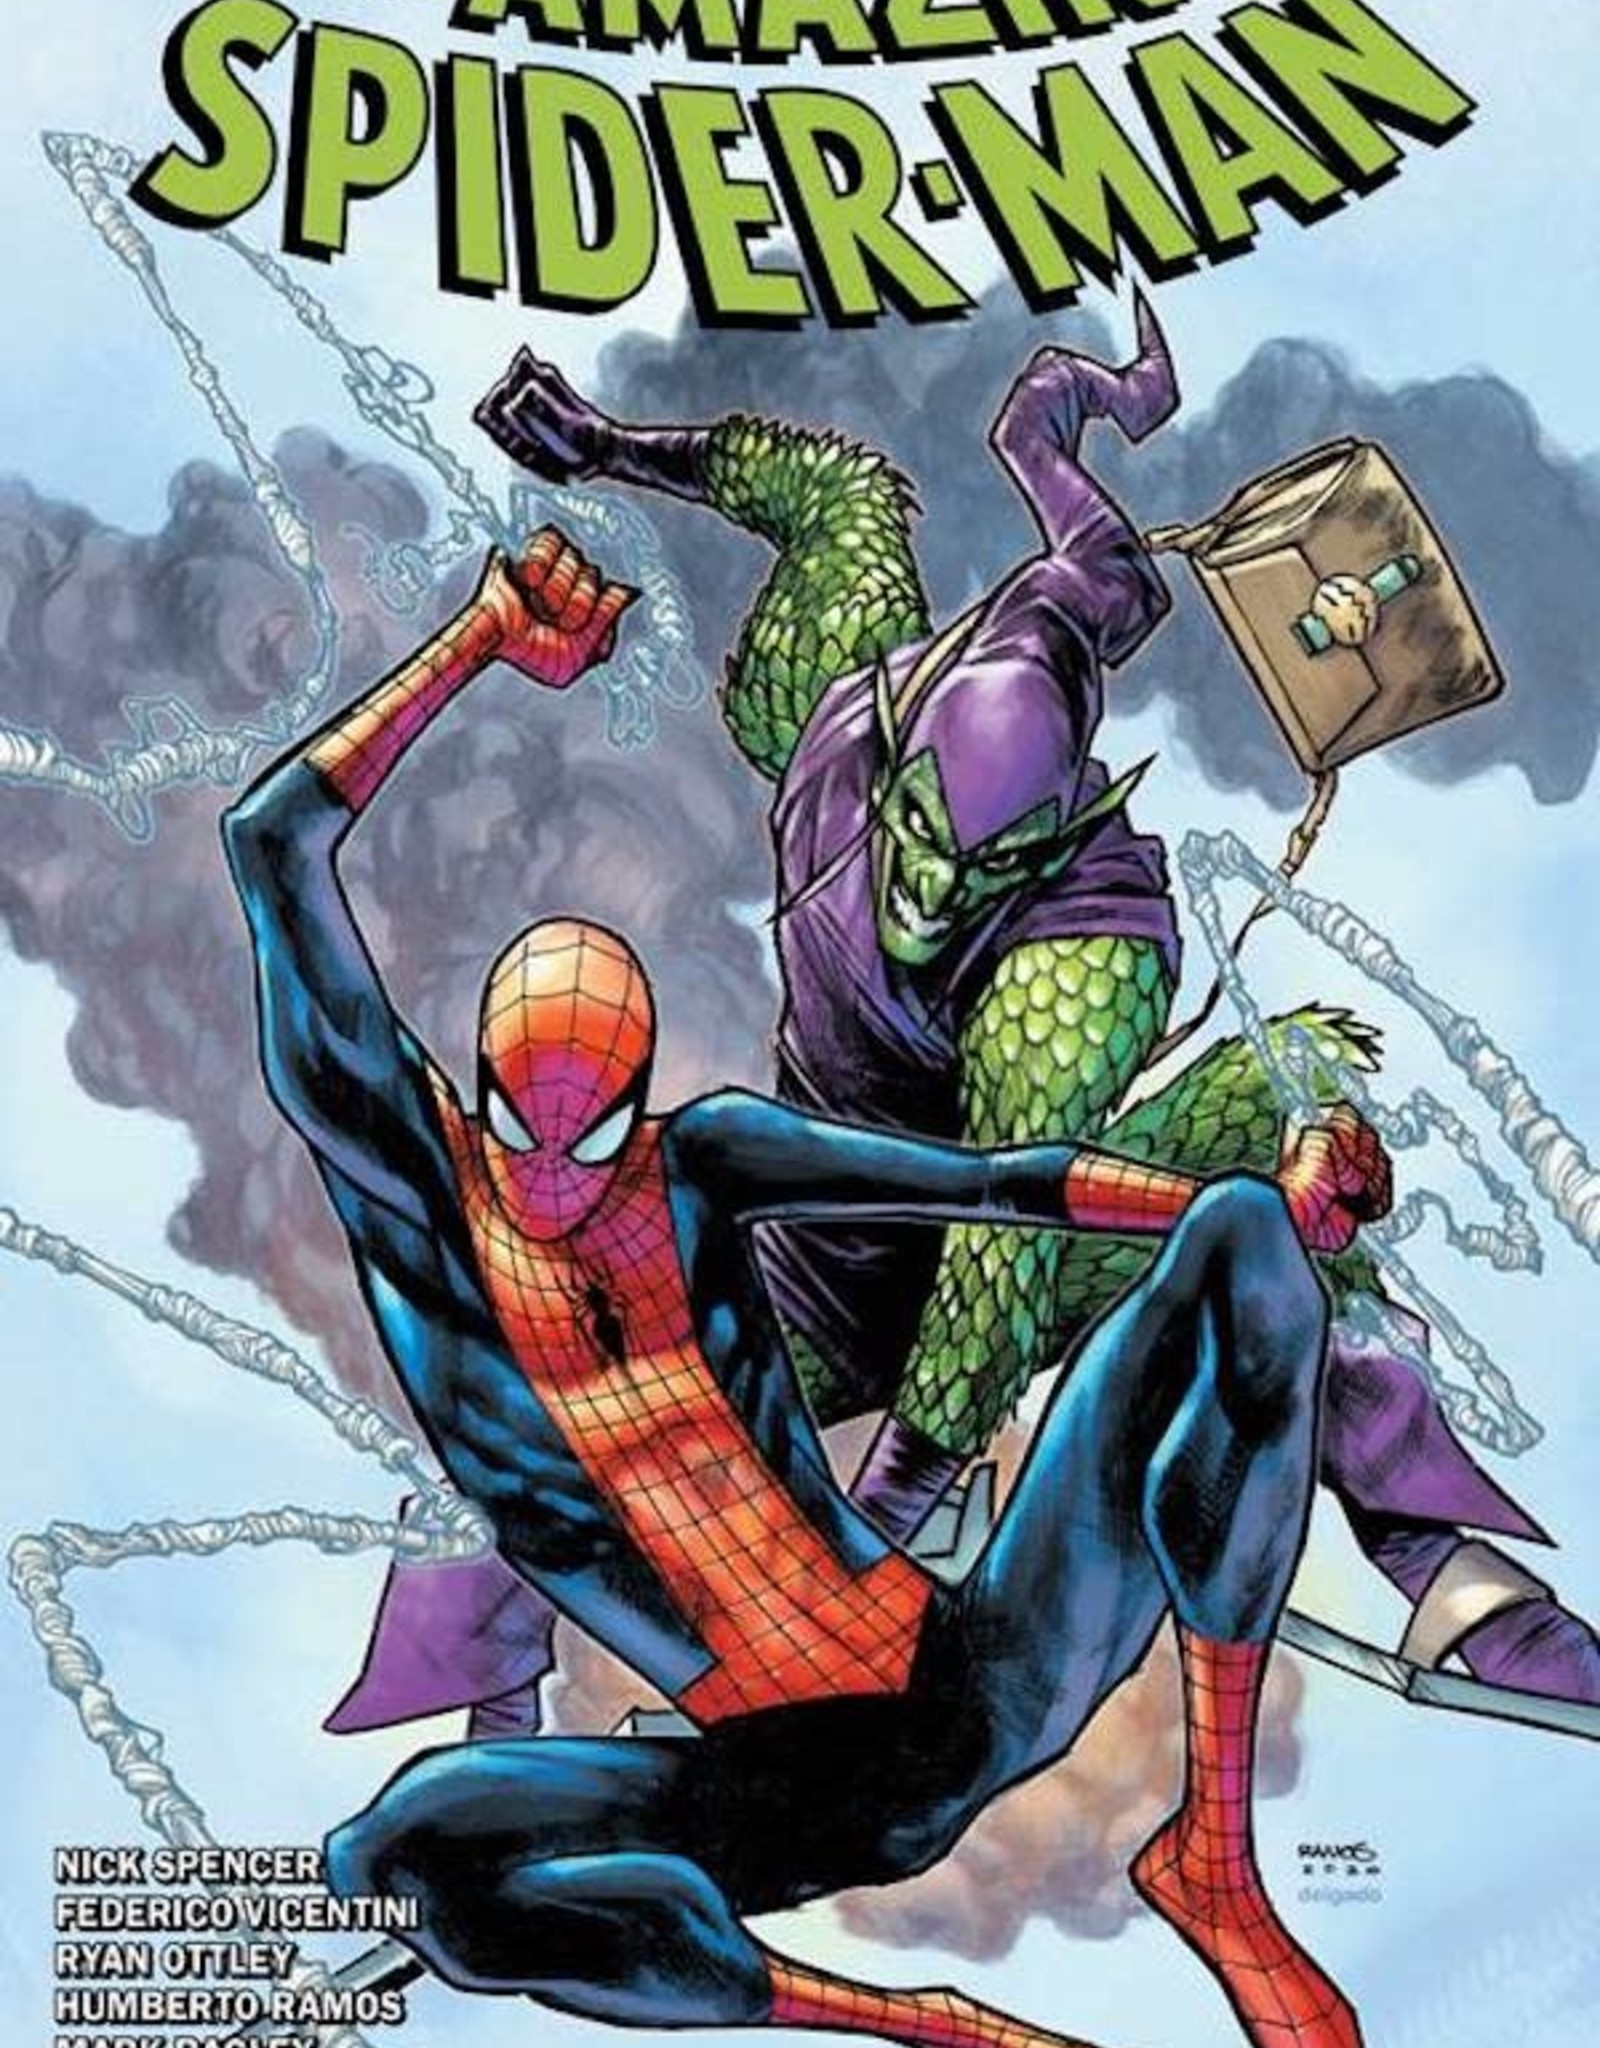 Marvel Comics Amazing Spider-Man By Nick Spencer Vol 10: Green Goblin TP